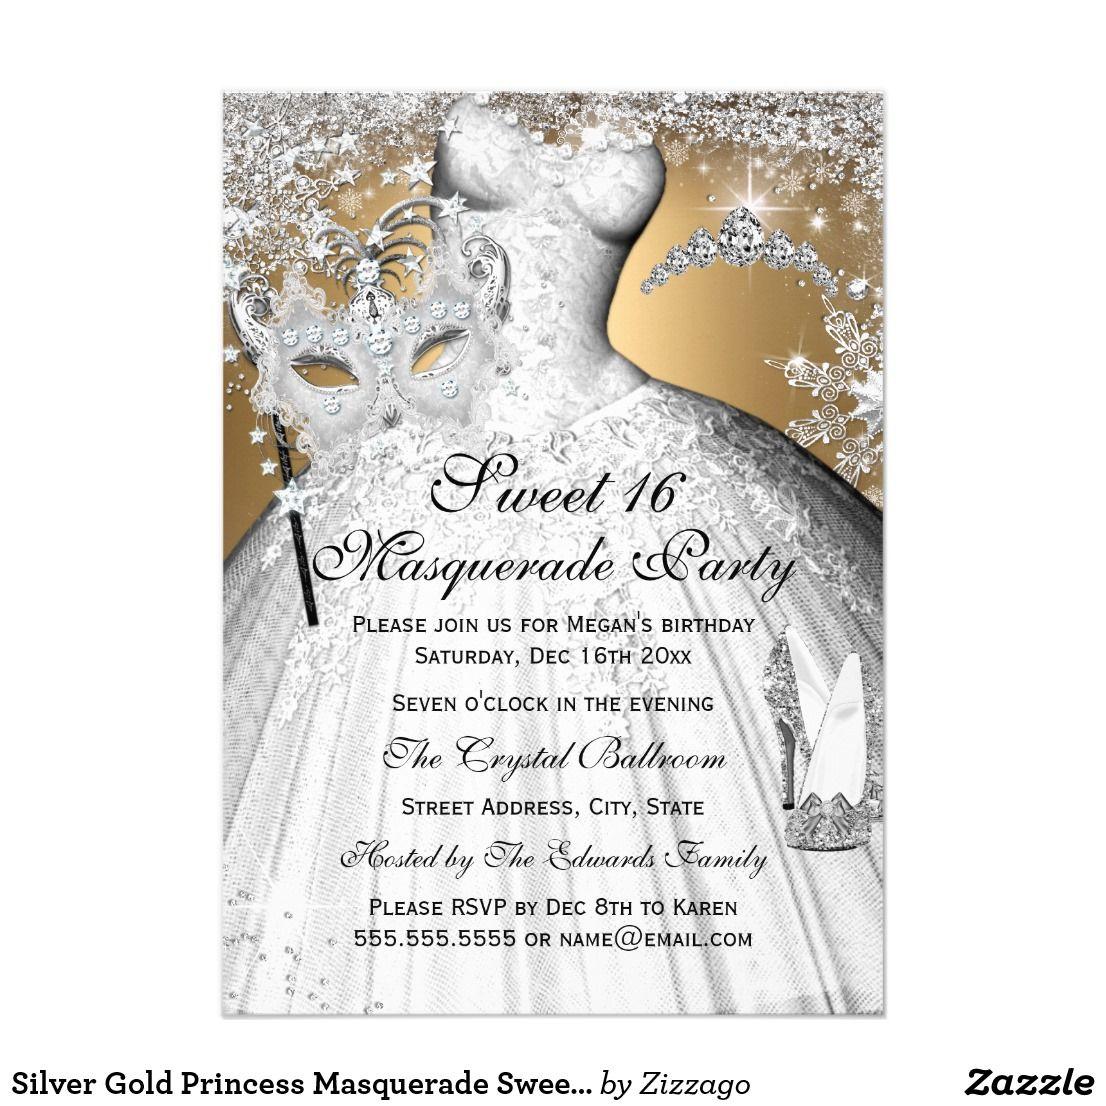 Silver Gold Princess Masquerade Sweet